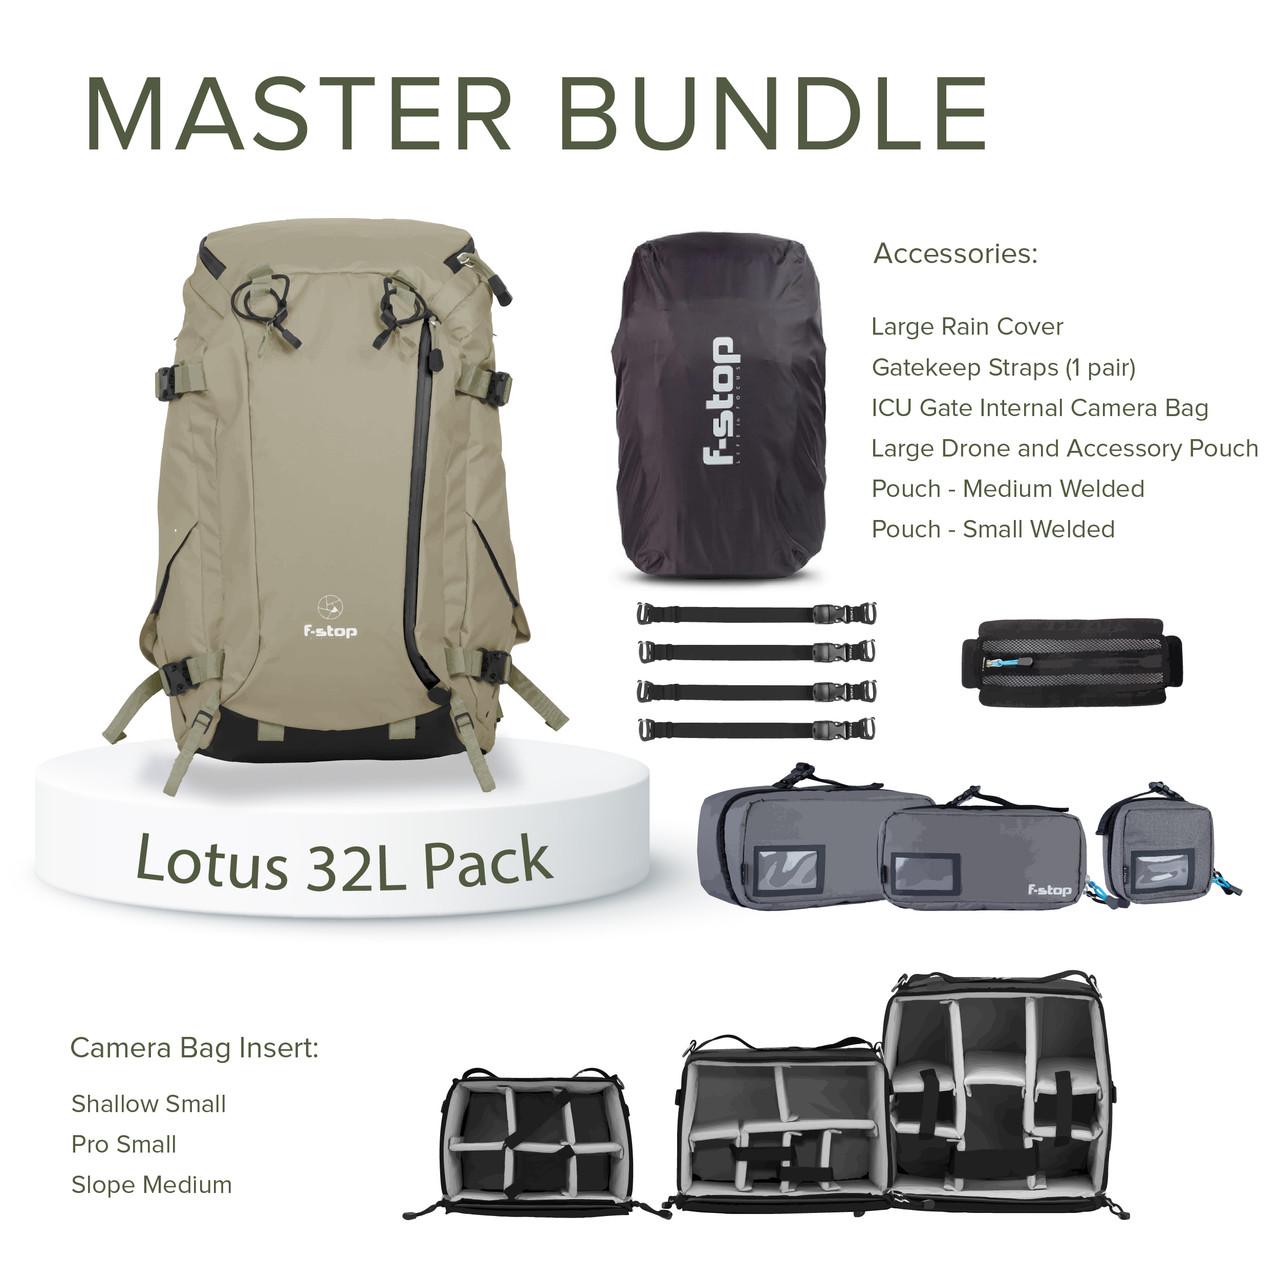 Lotus 32 Liter Backpack Master Bundle